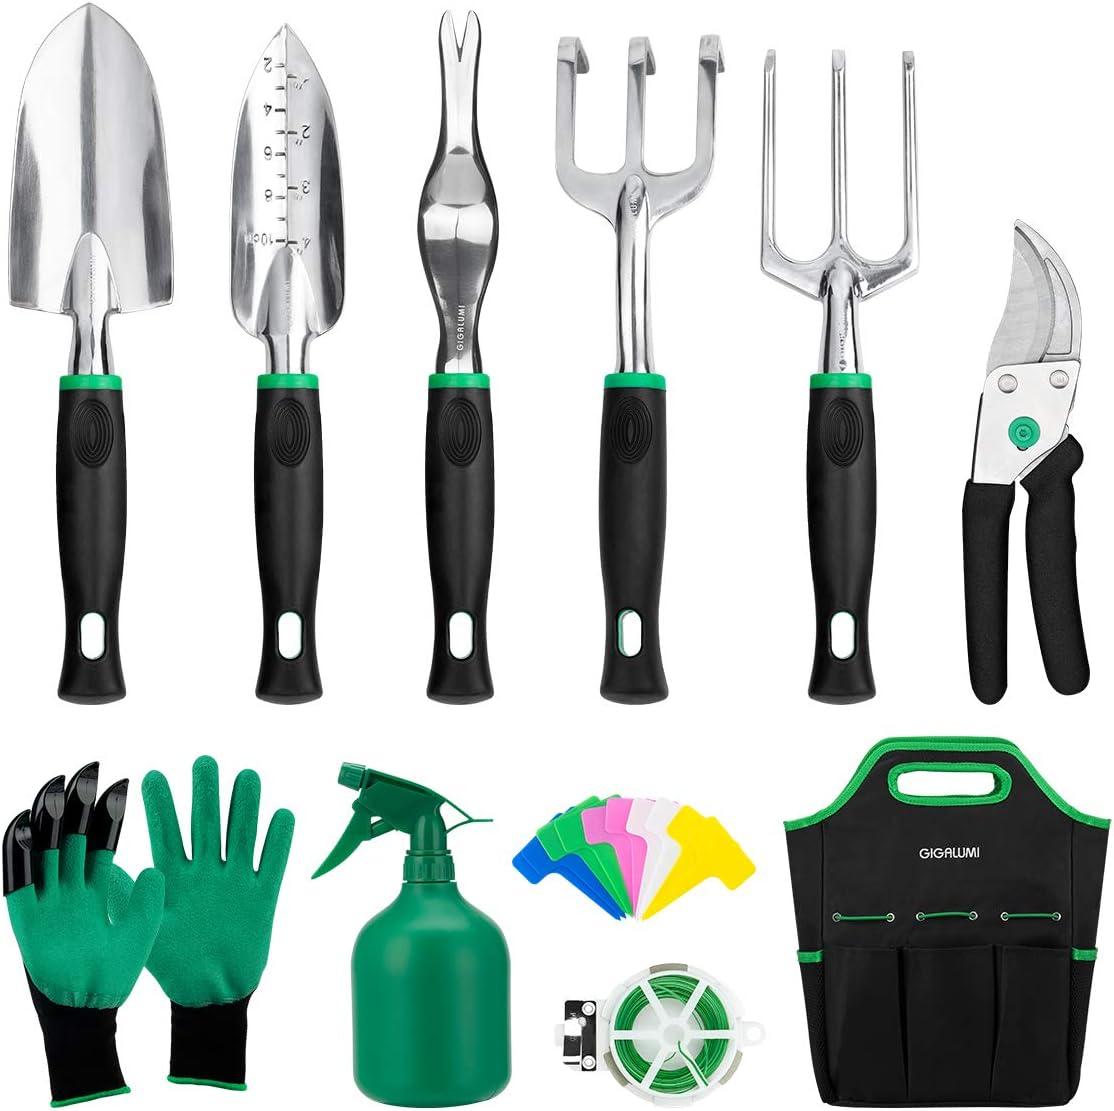 Garden Tool Set 3 Pcs Cast-Aluminum Heavy Duty Gardening Kit Non-Slip Ergonomic